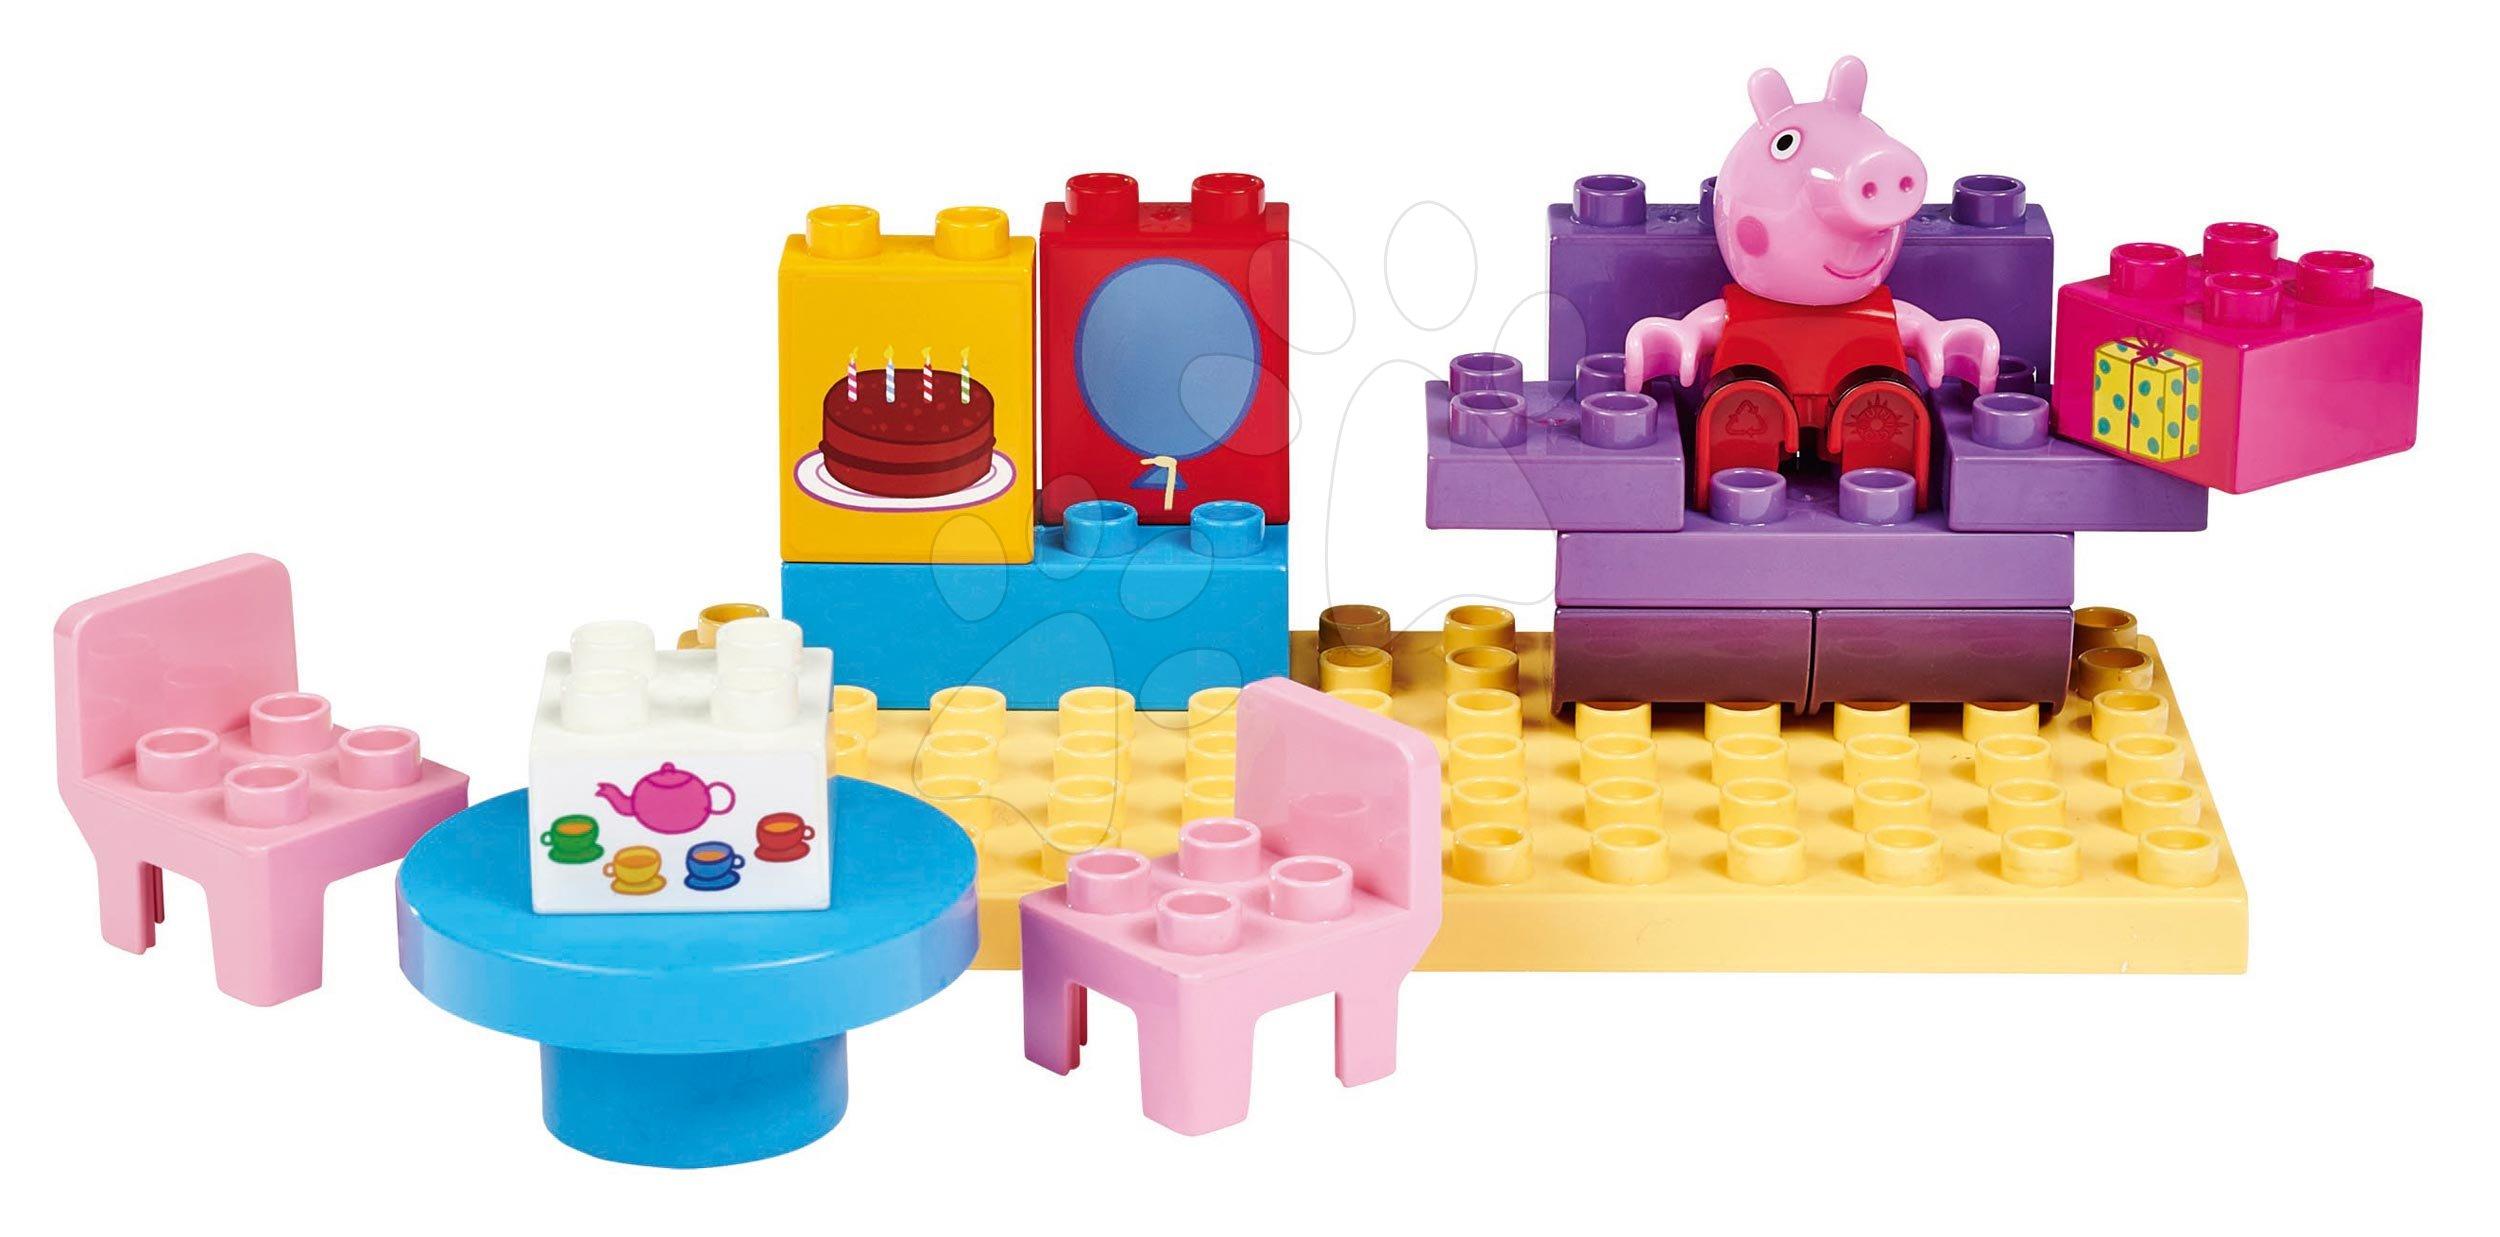 Stavebnica Peppa Pig Basic Sets II. PlayBIG Bloxx s figúrkou v kuchyni od 18 mes